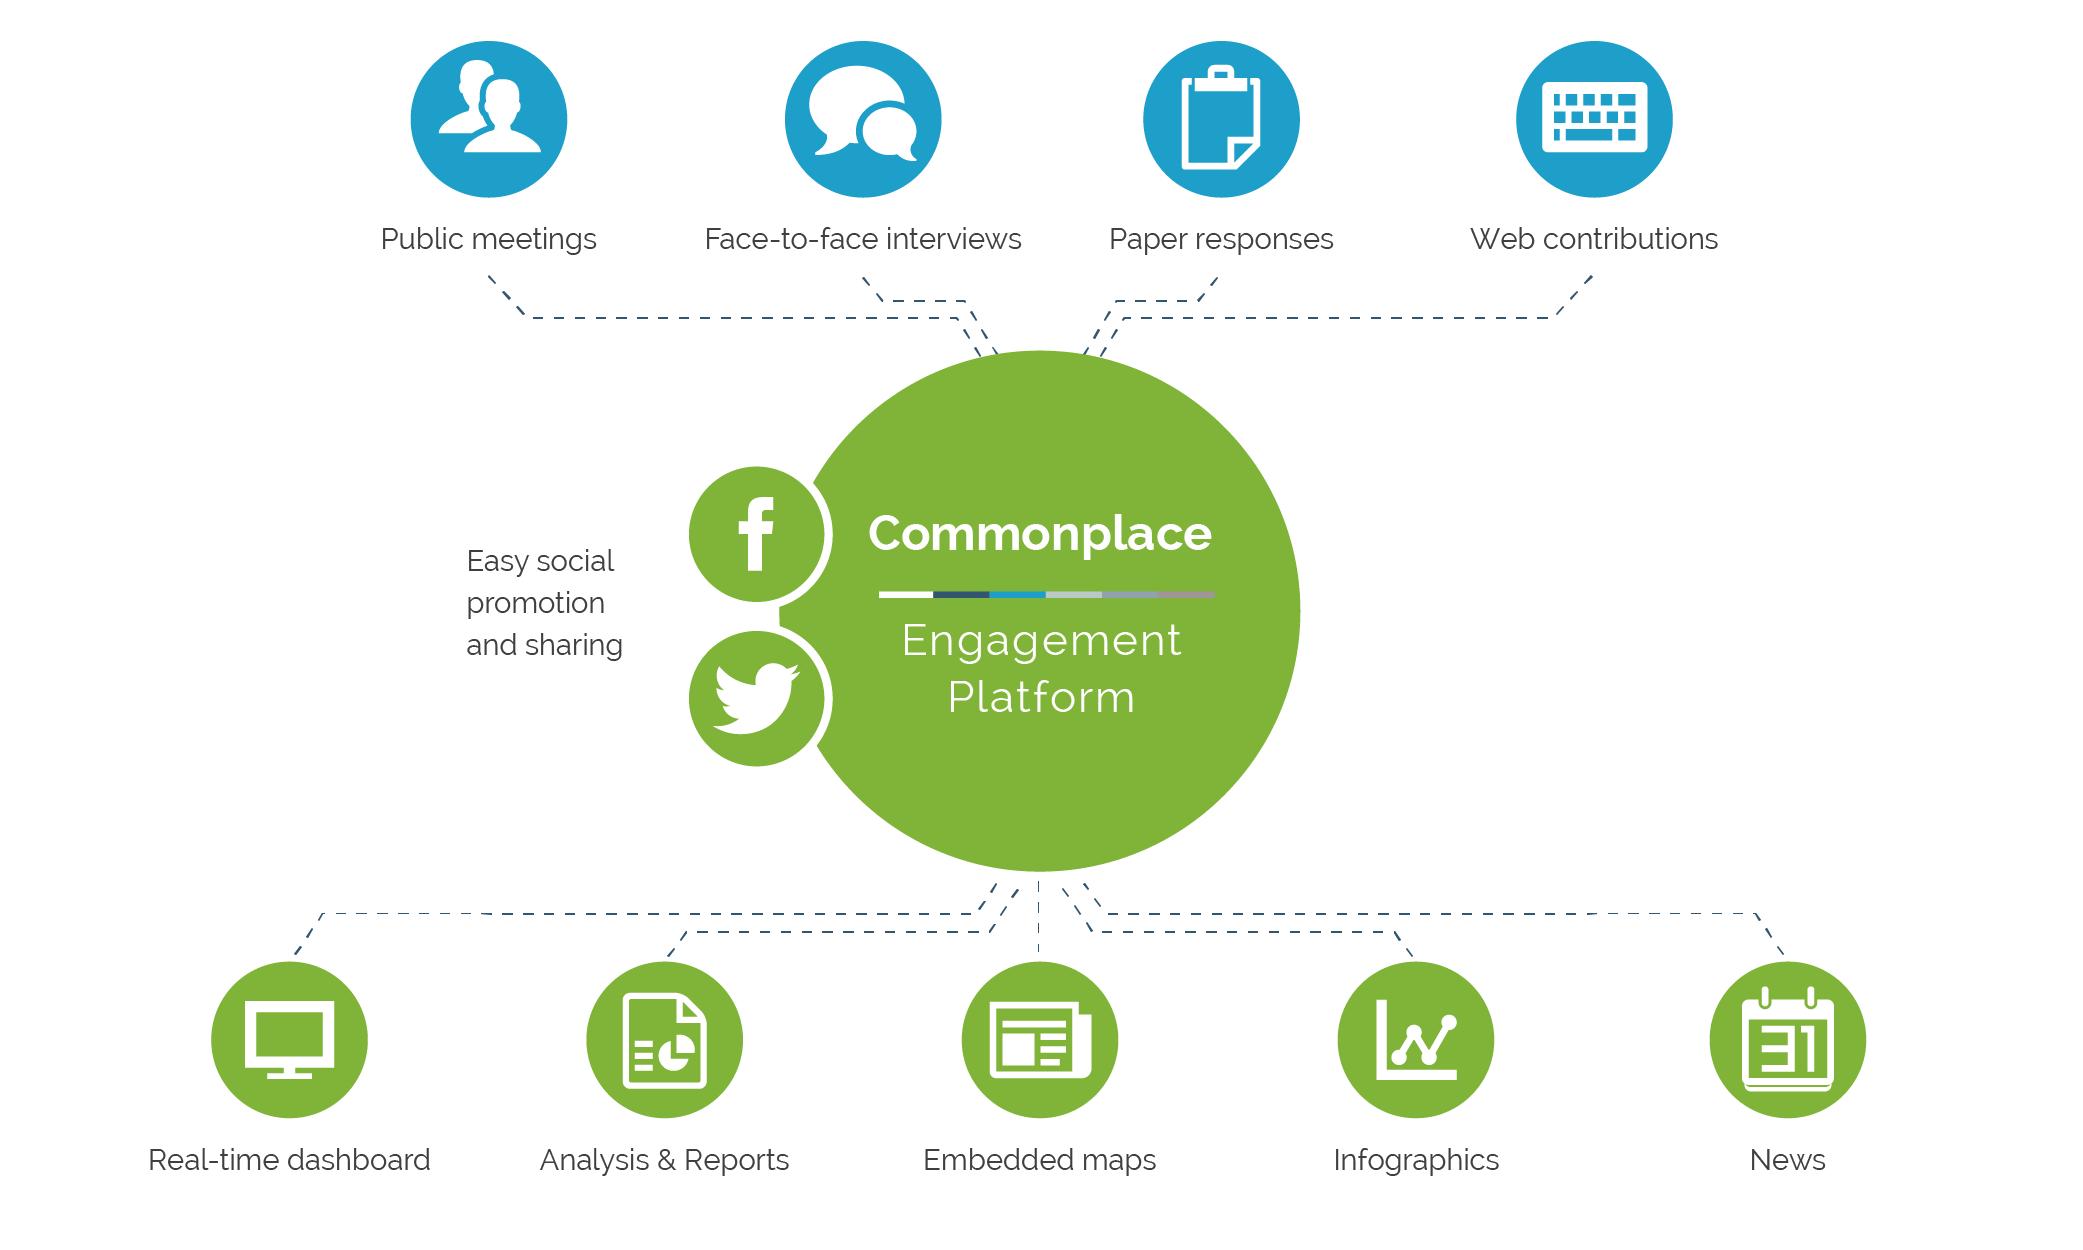 engagement-platform.png